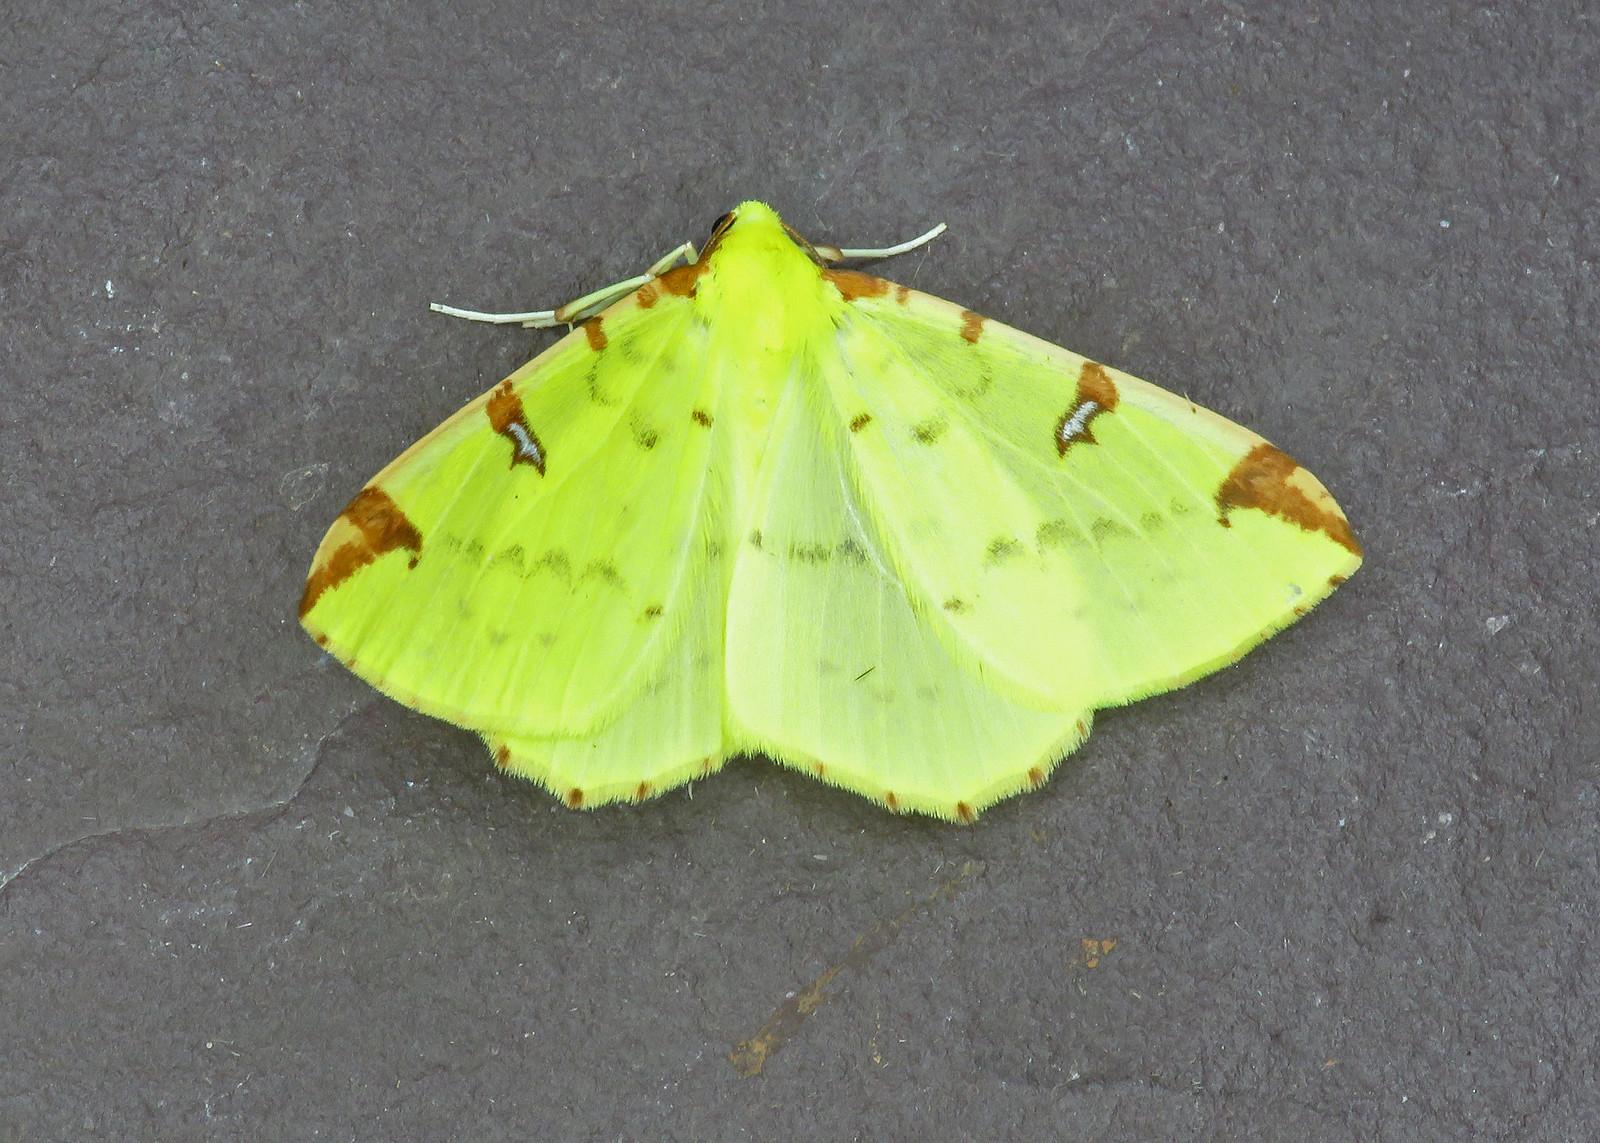 70.226 Brimstone Moth - Opisthograptis luteolata